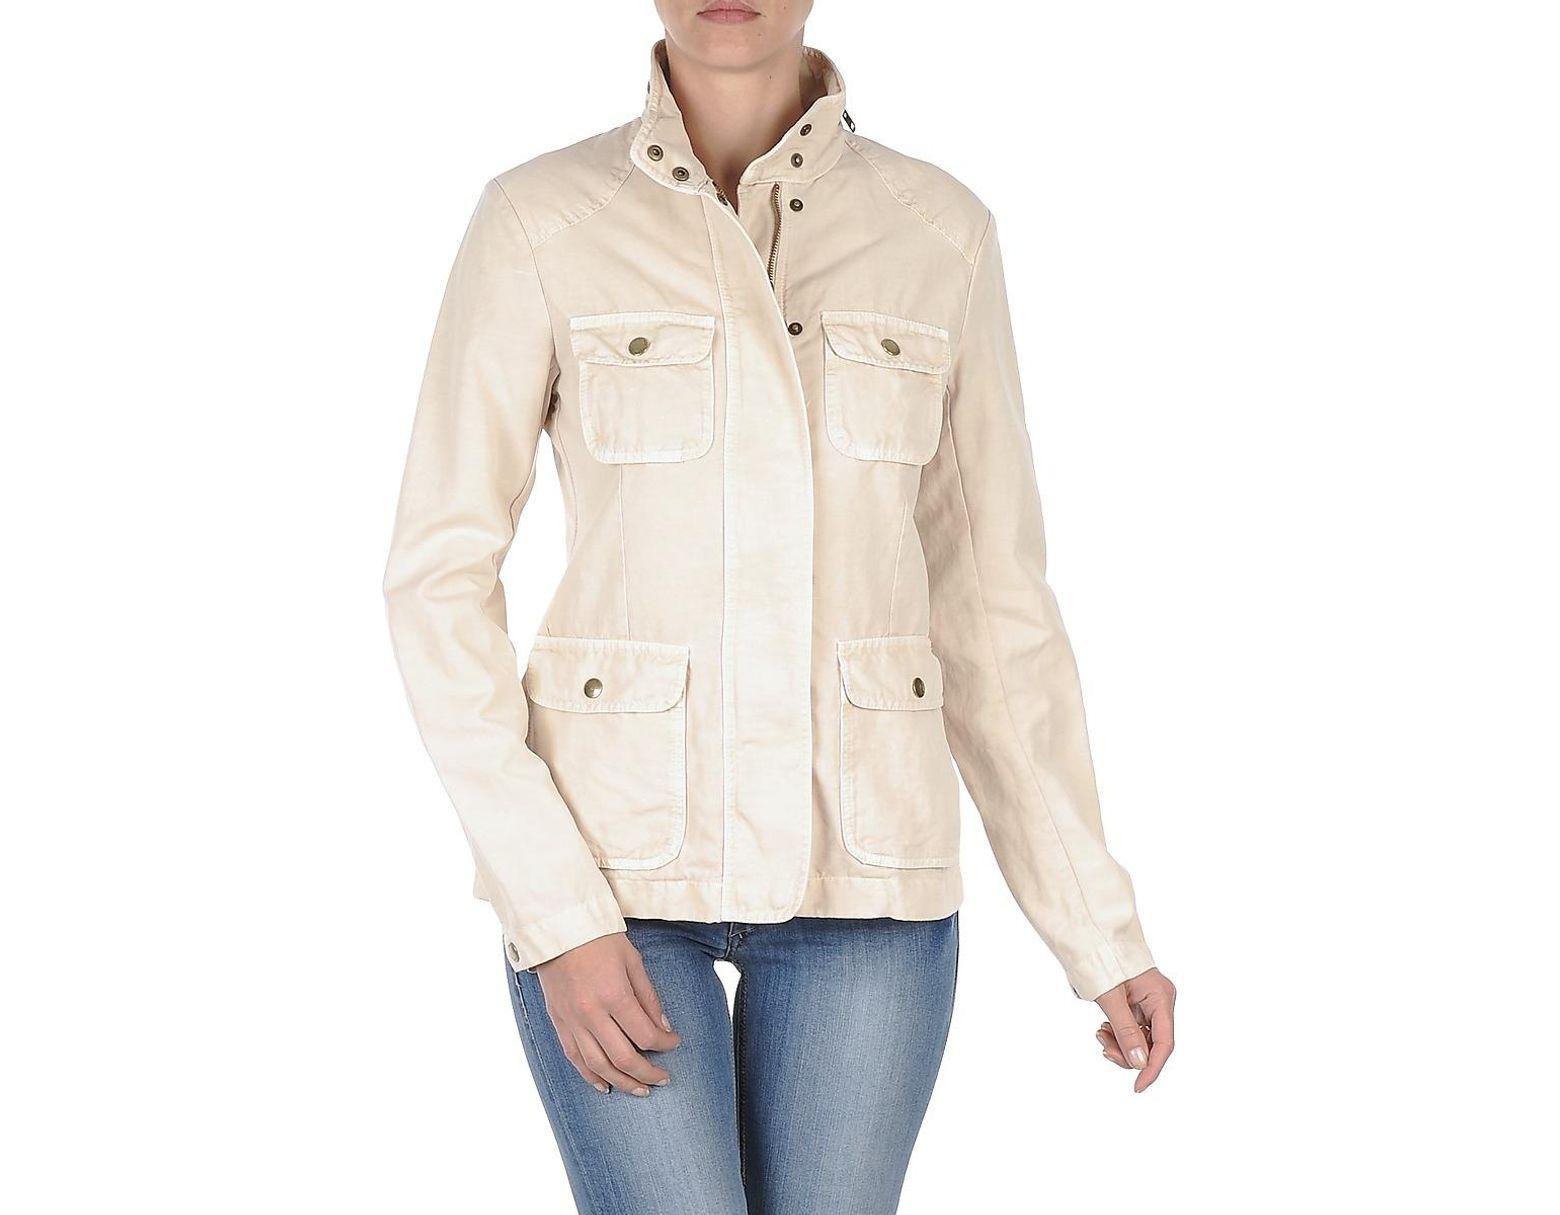 372e7f5ae5708 Women's Natural Cotton Linen 4pkt Jacket Jacket